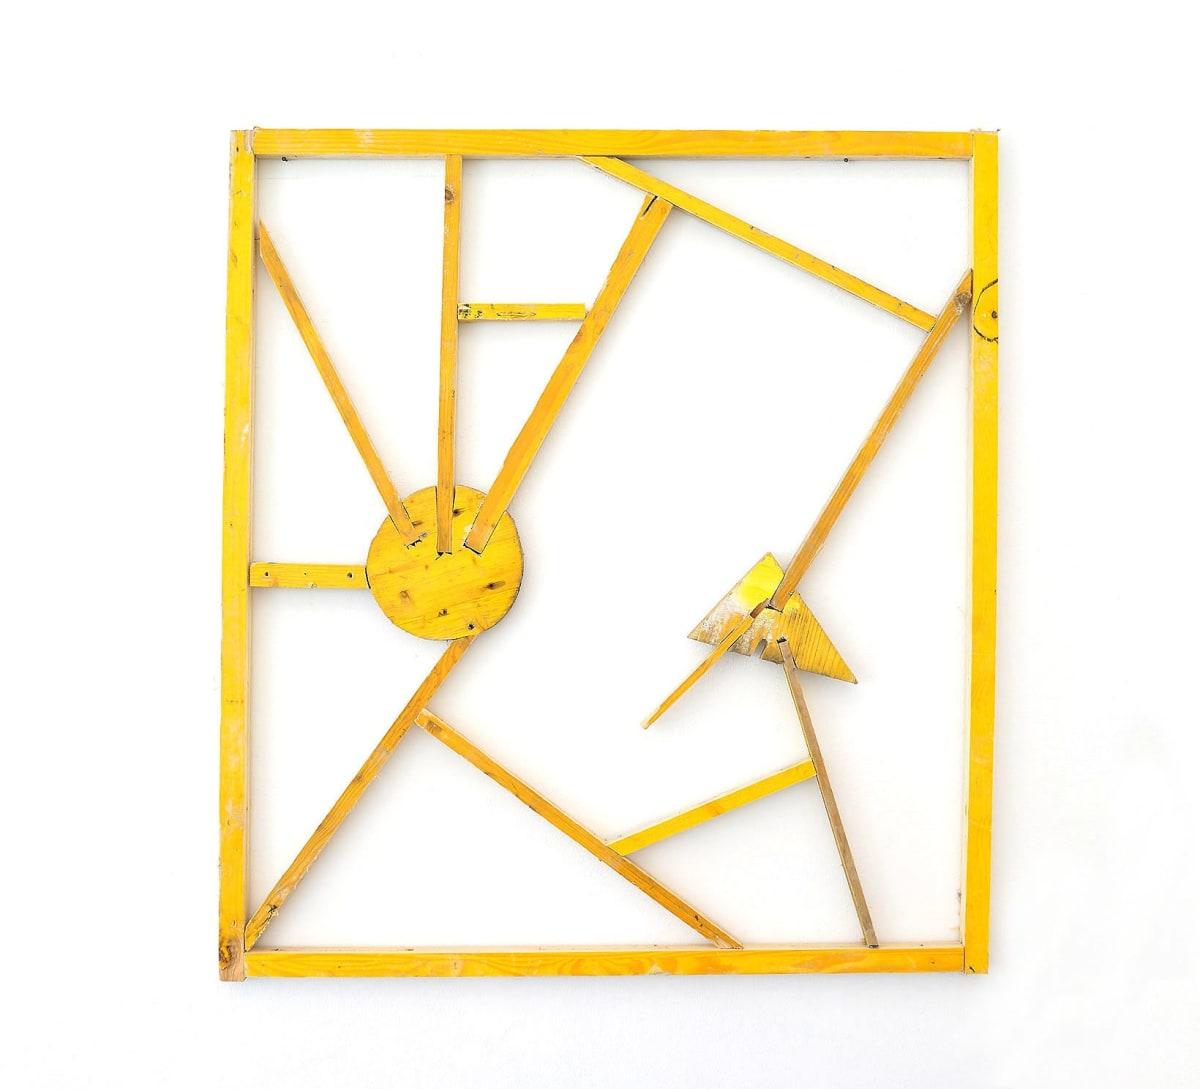 ernst koslitsch shows a filigree sculpture from yellow building site wood